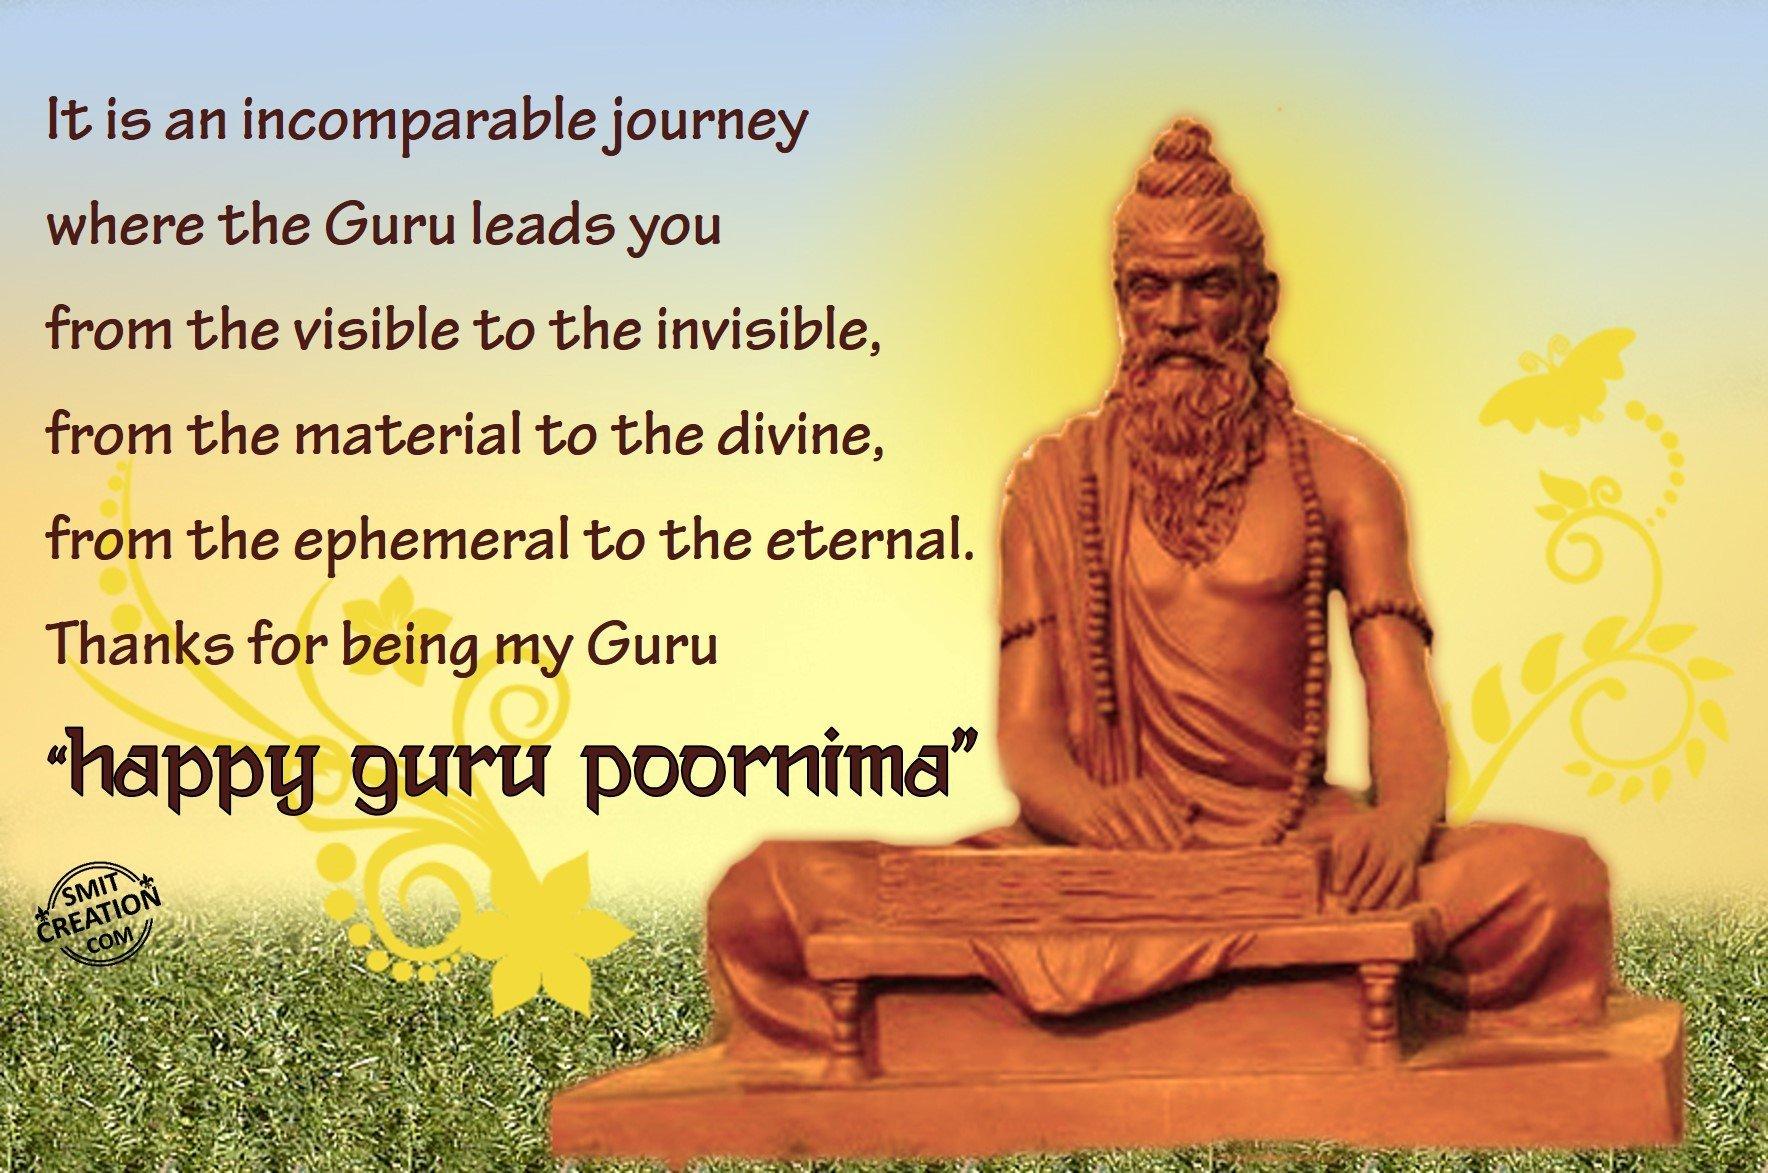 Happy Guru Poornima - SmitCreation.com